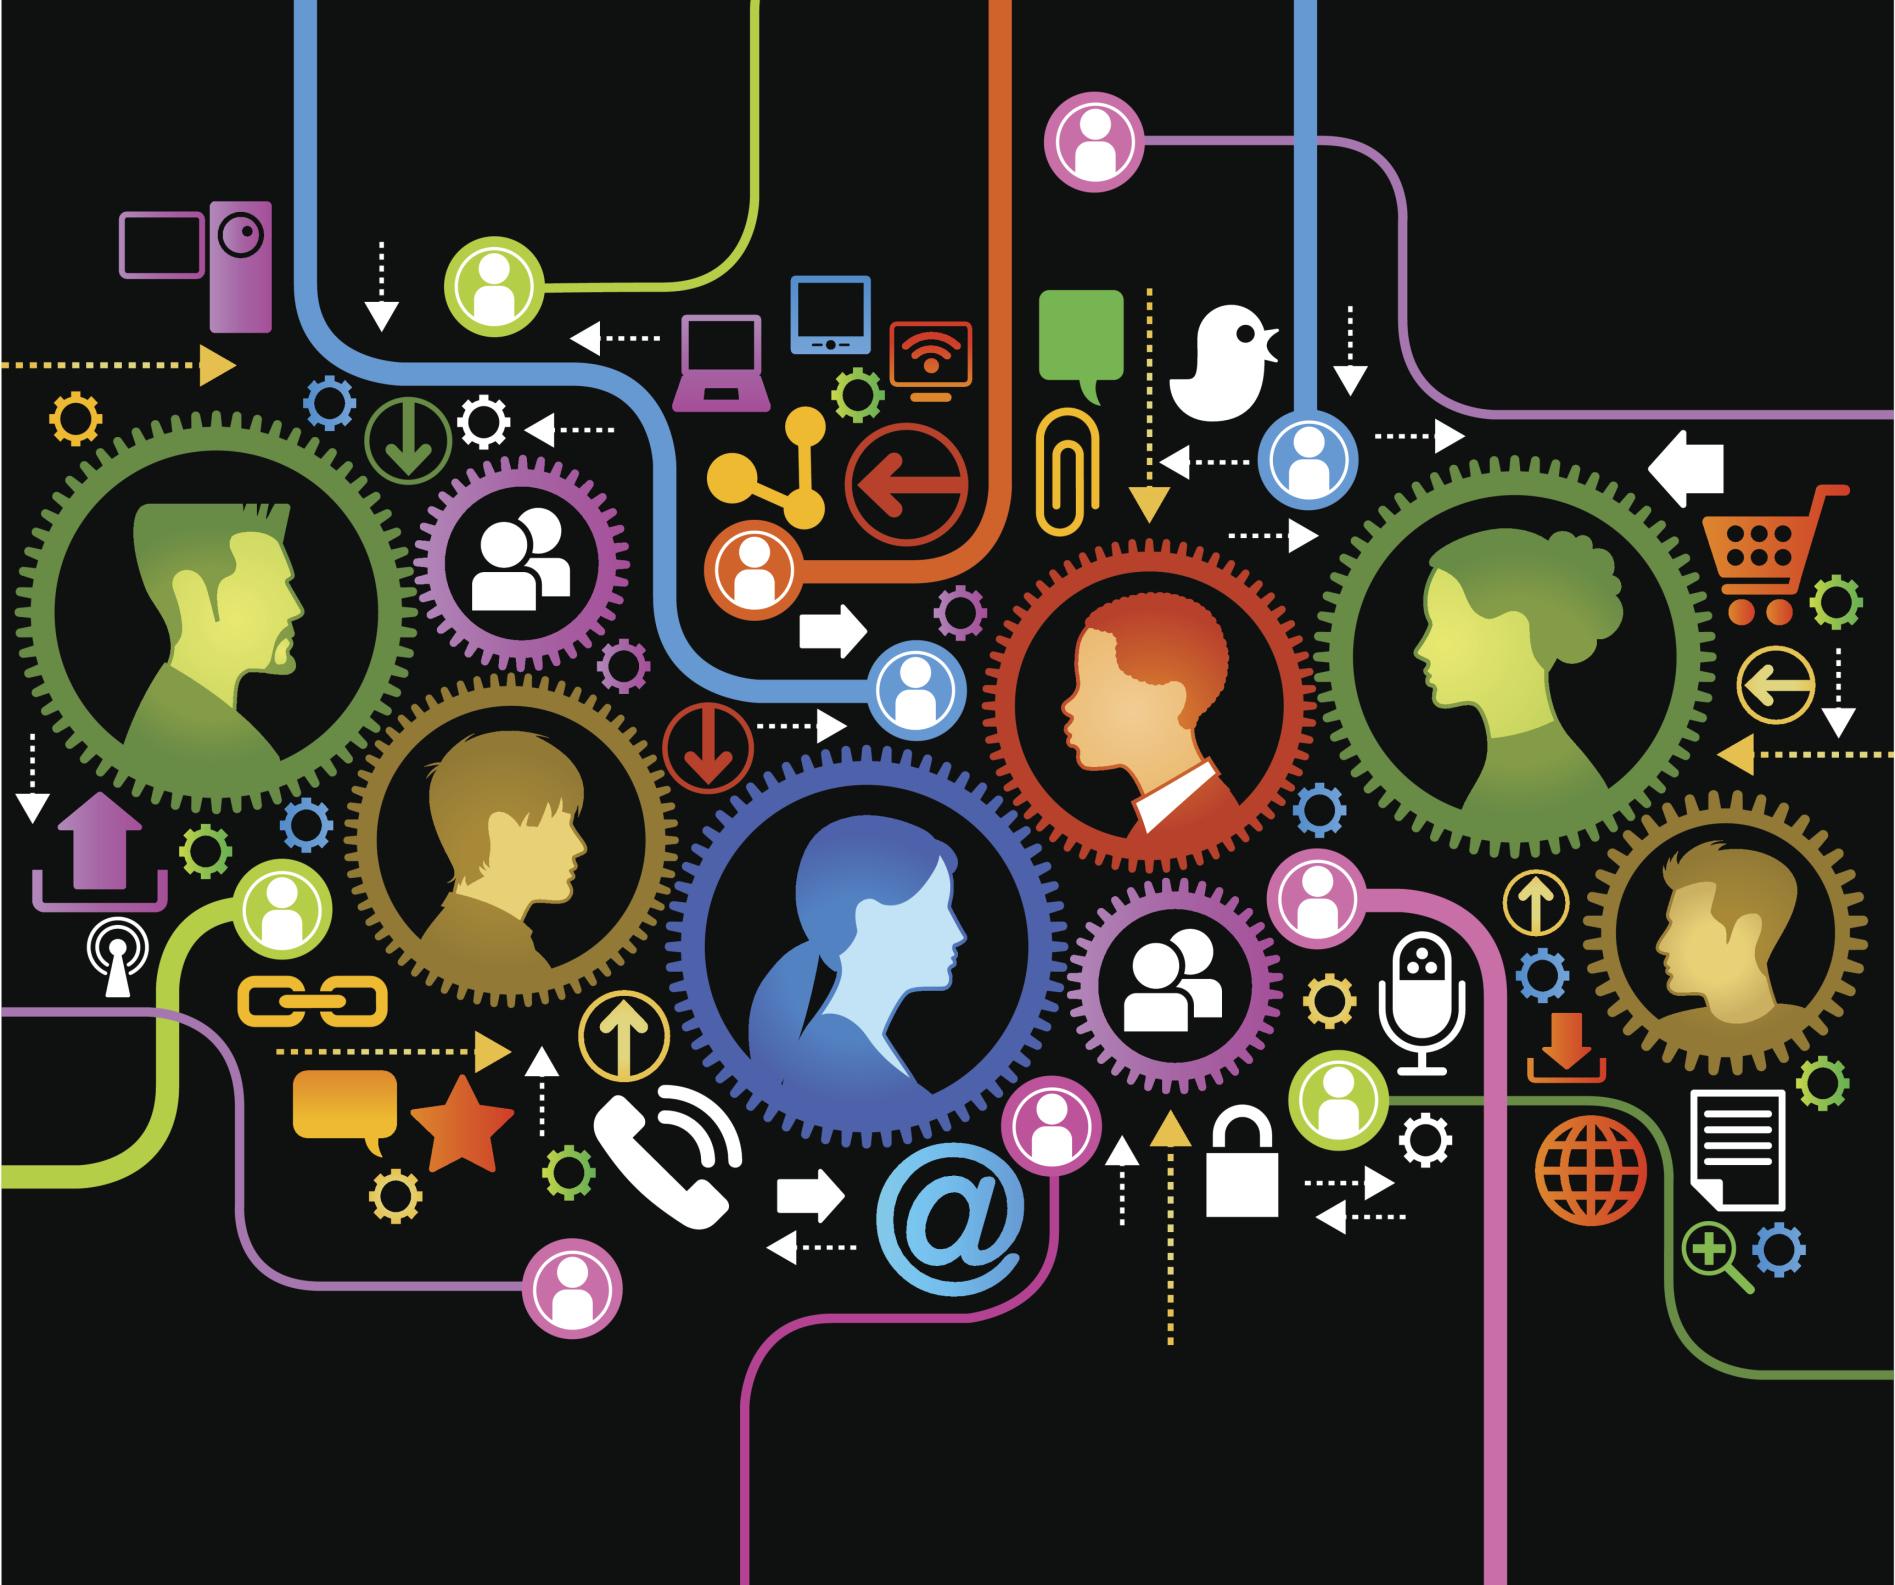 collaboration3-28b3ii5 Technology Platforms Examples on digital government, web application, social media, world wide web, internet marketing, web service, social media marketing, what's new, tim berners-lee, business model, cloud computing, adjustable cartoon, social network, small business, web design, common software,